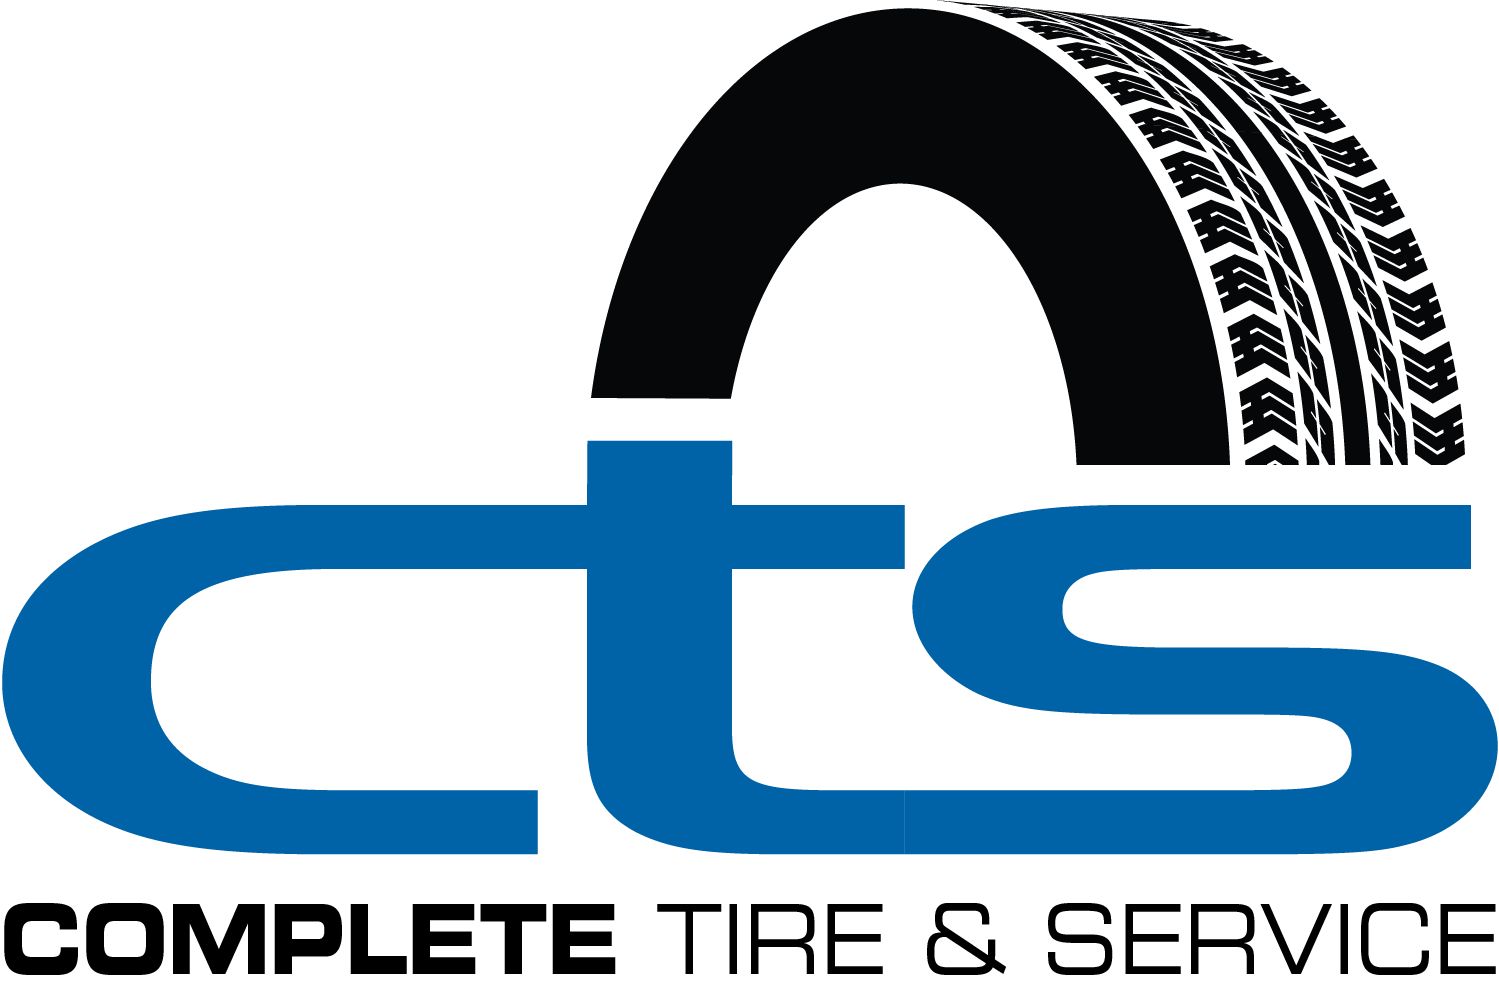 Complete Tire & Service